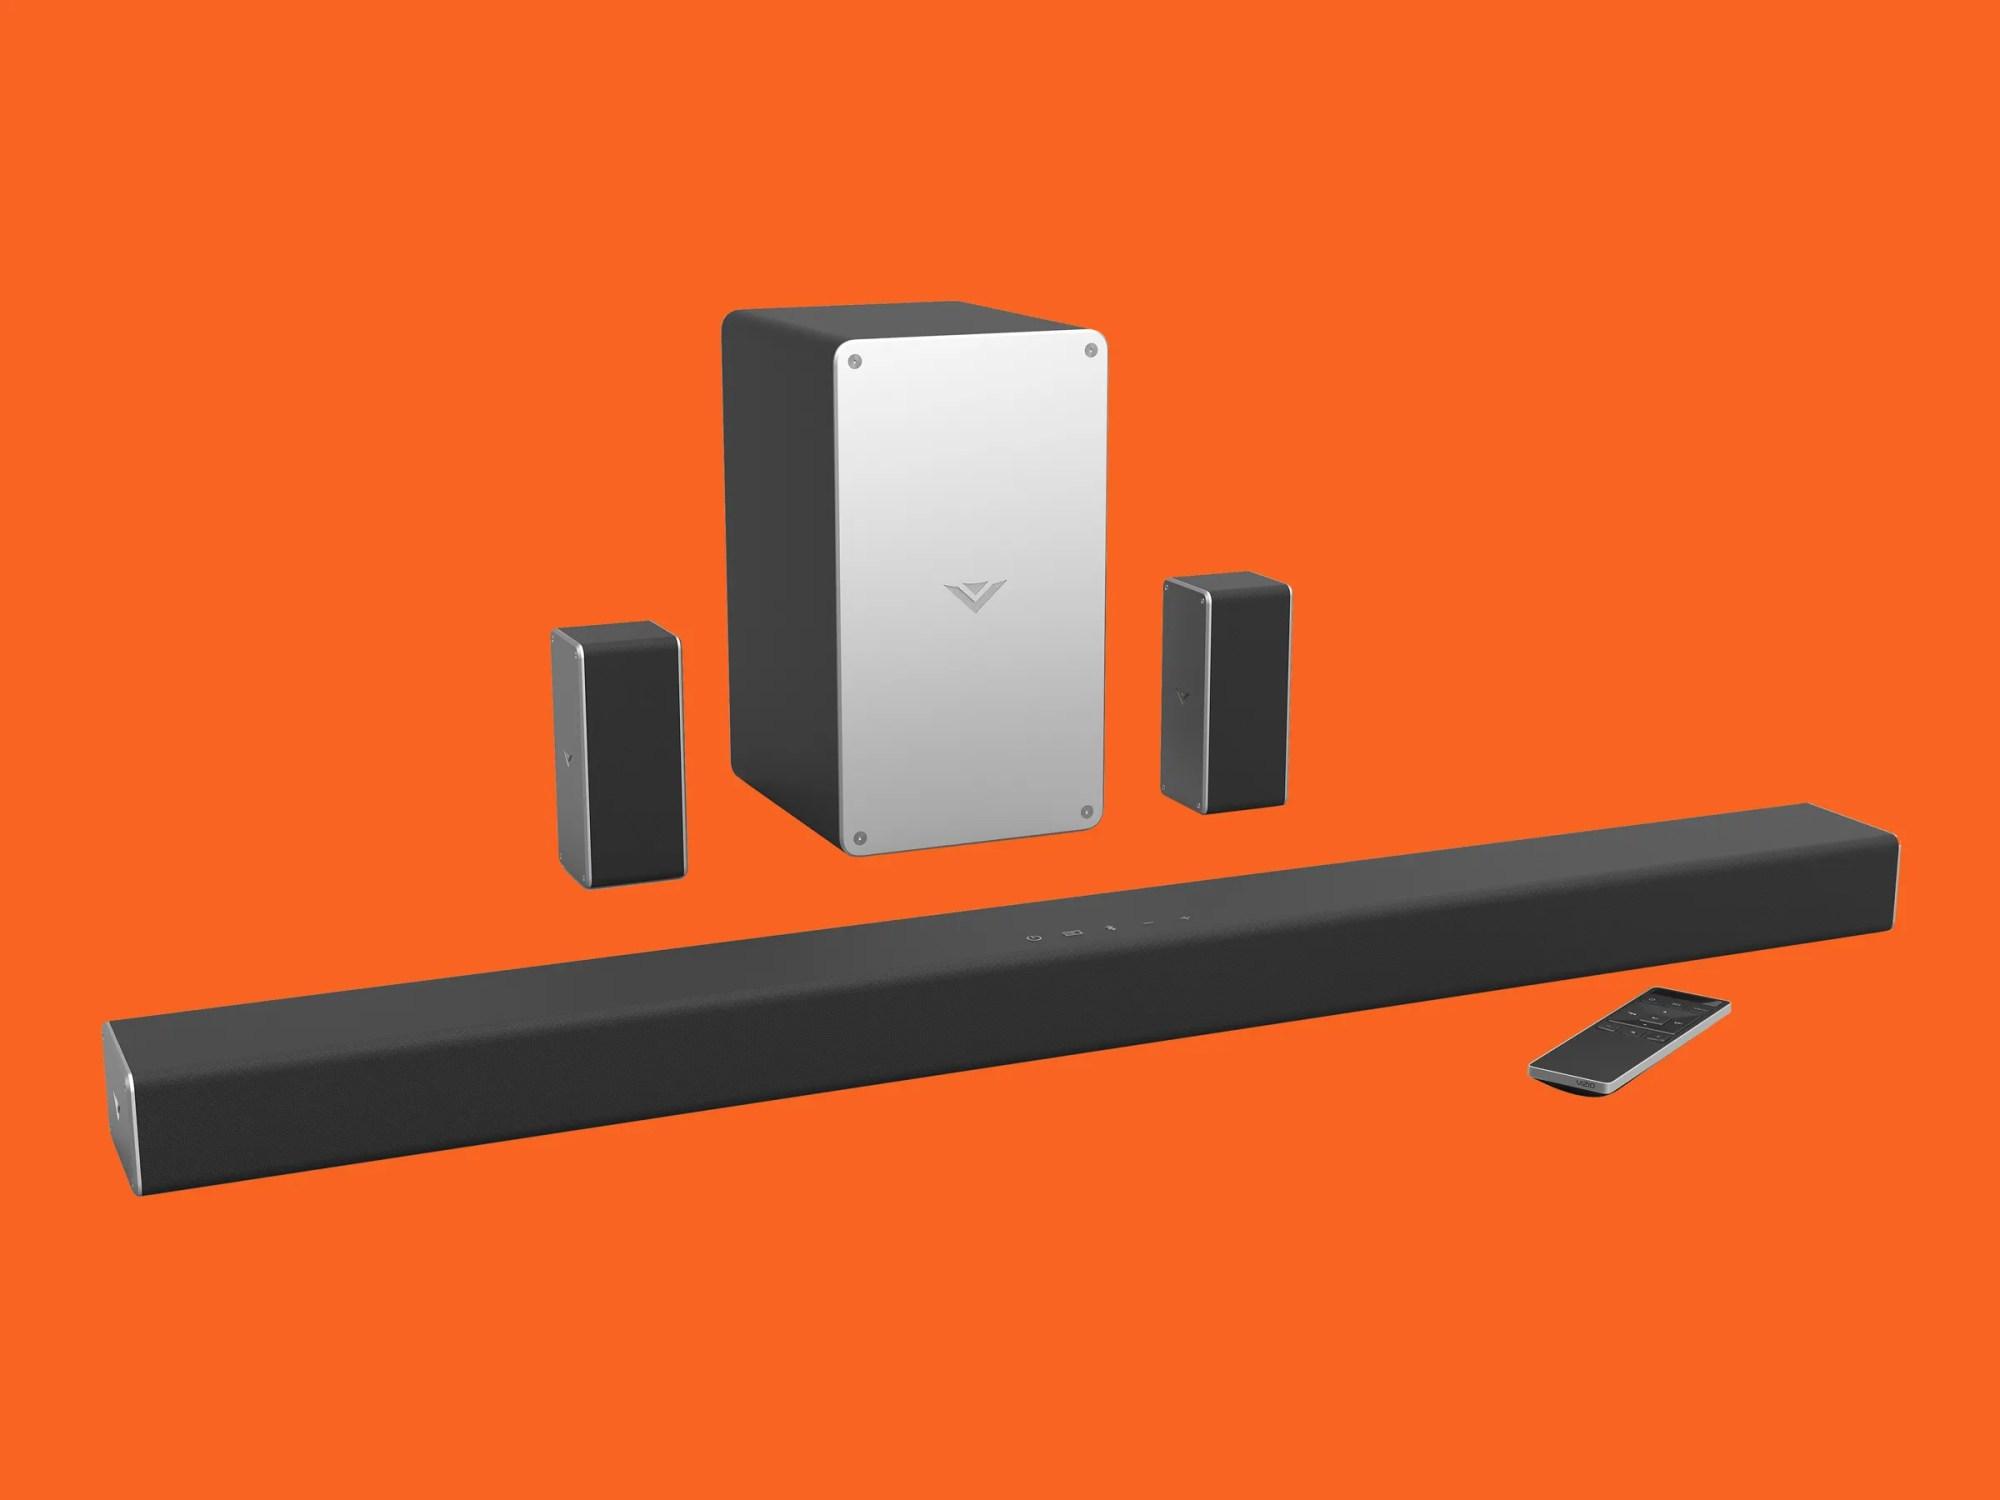 hight resolution of review vizio smartcast soundbar and surround speakers